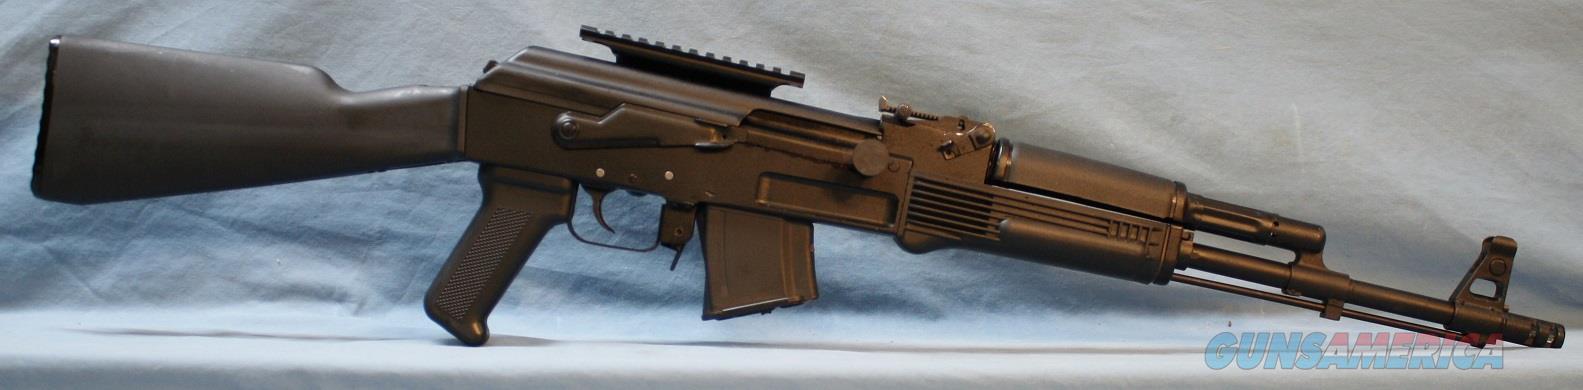 Arsenal SLR-101s Semi-Automatic Rifle, made in Bulgaria, 7.62x39mm   Guns > Rifles > A Misc Rifles